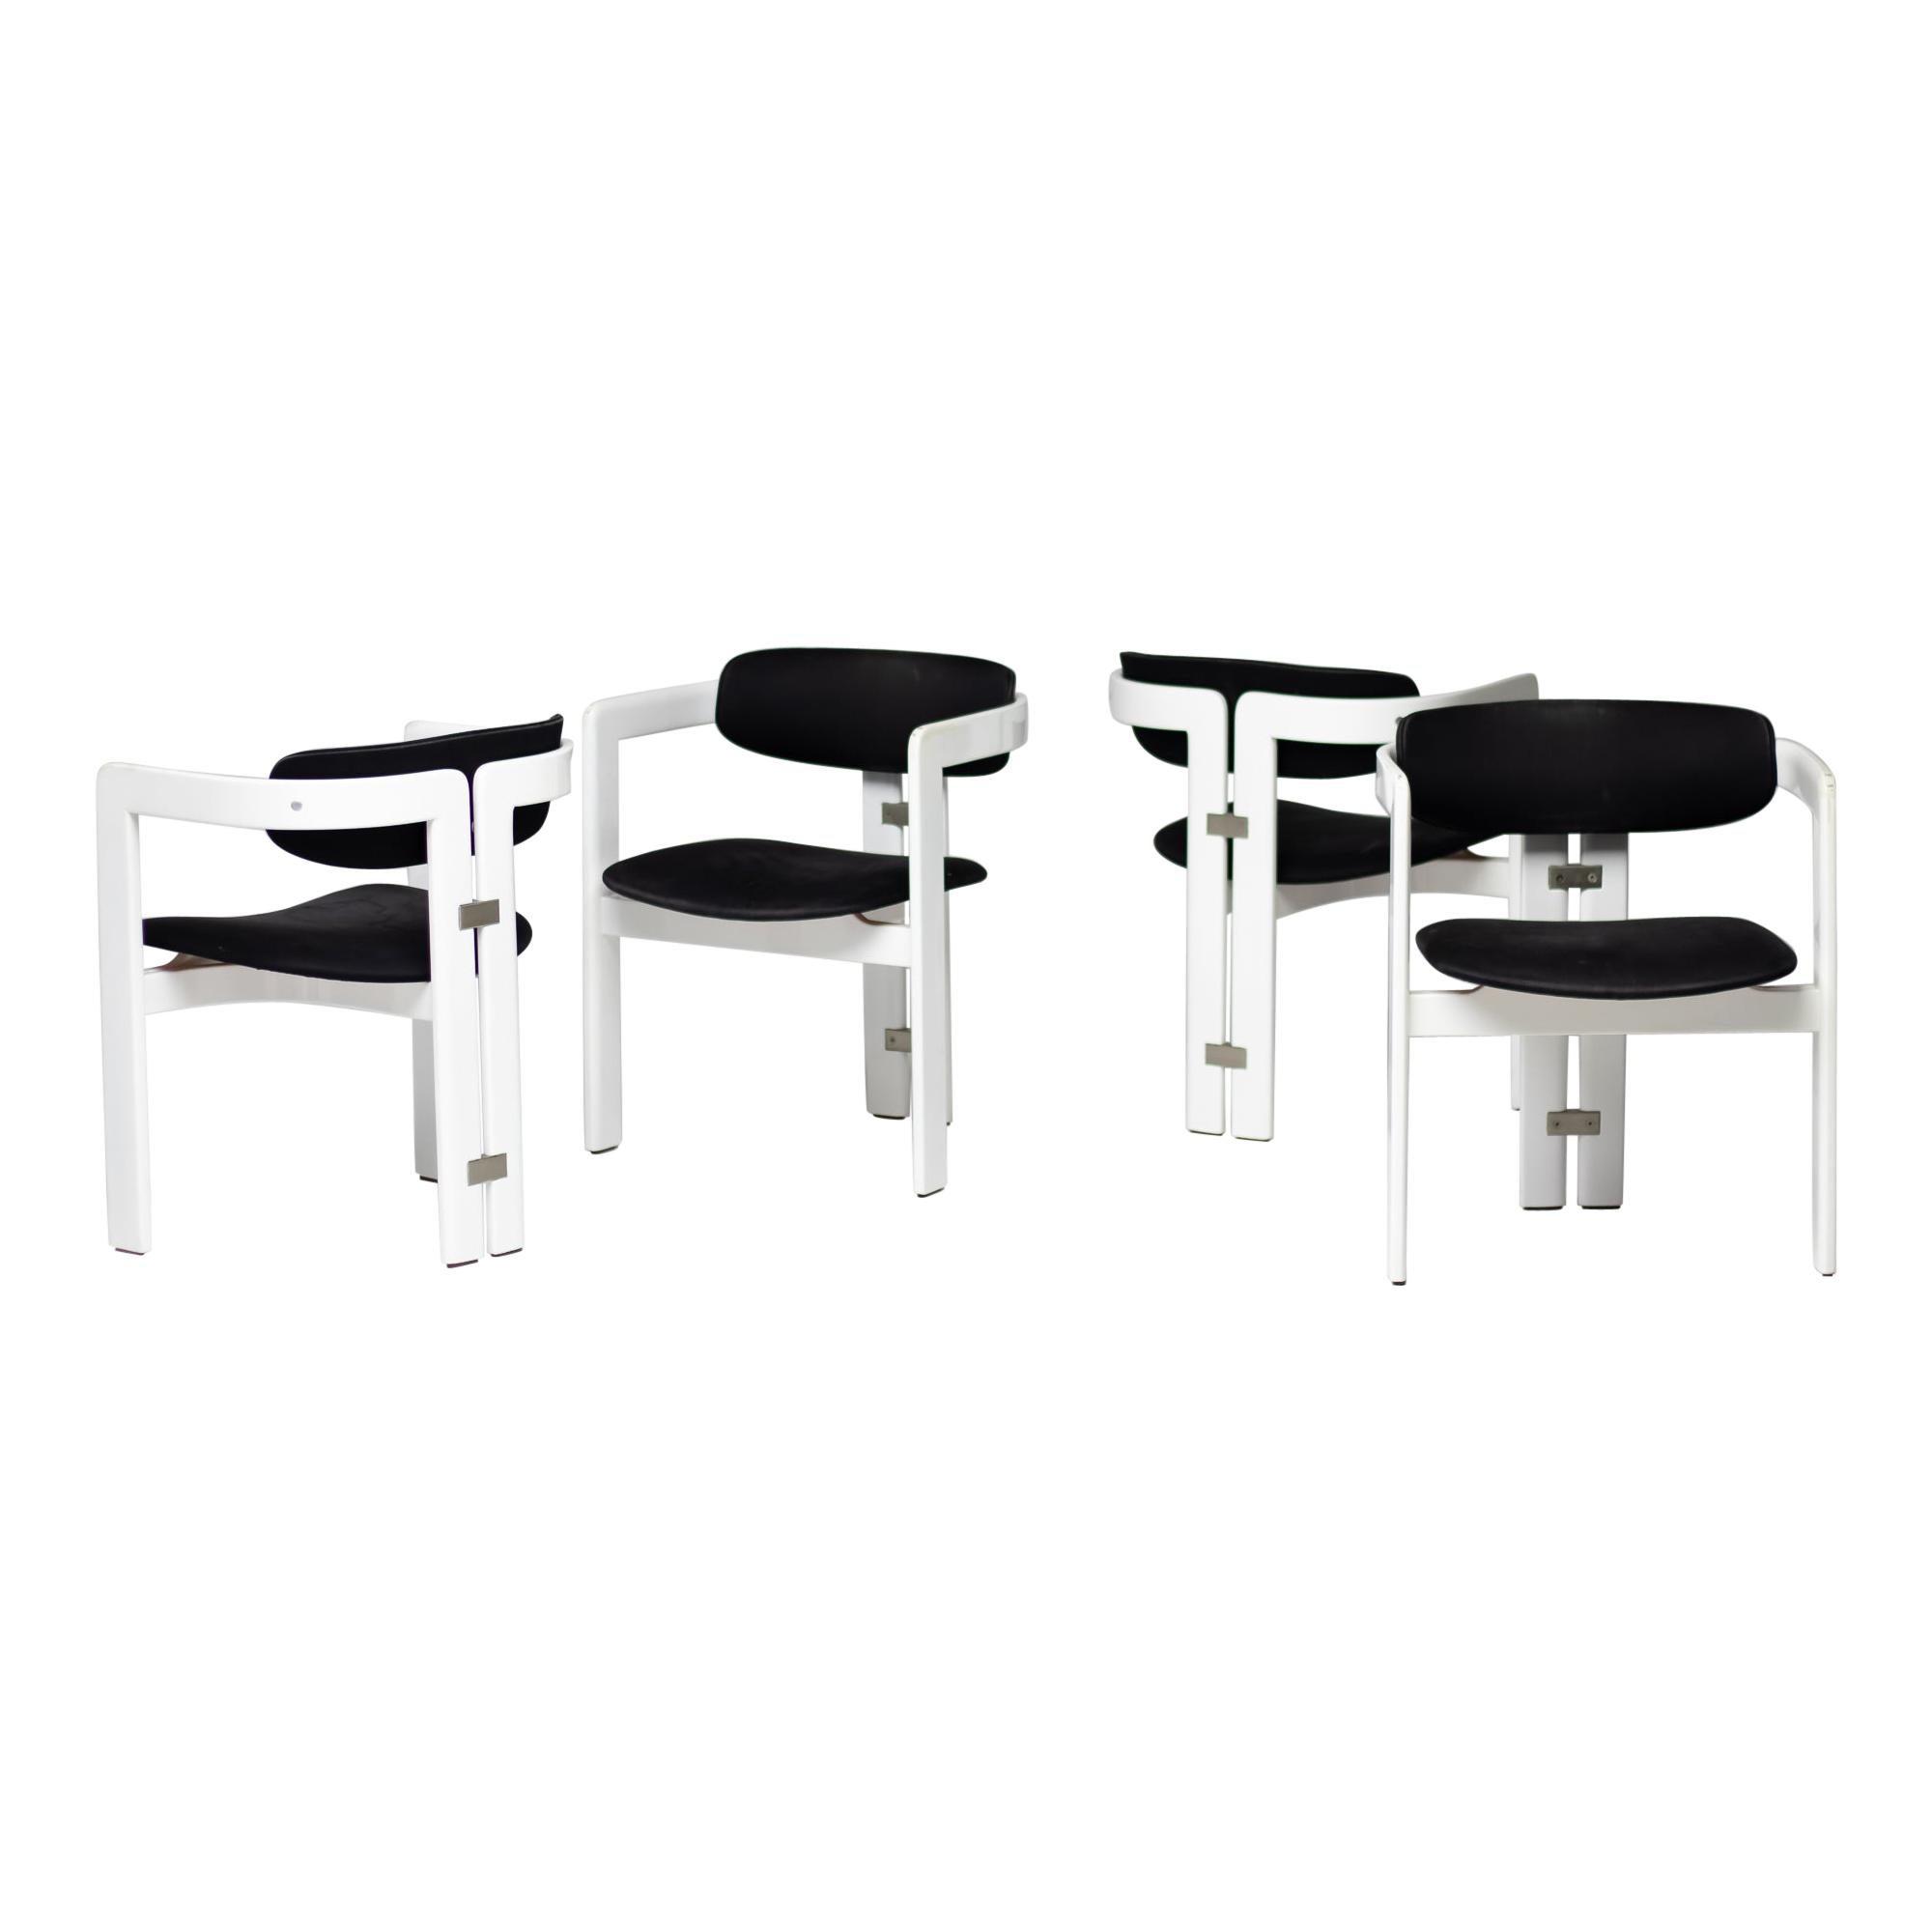 Augusto Savini 'Pamplona' Dining Chairs by Pozzi, Italy, 1965